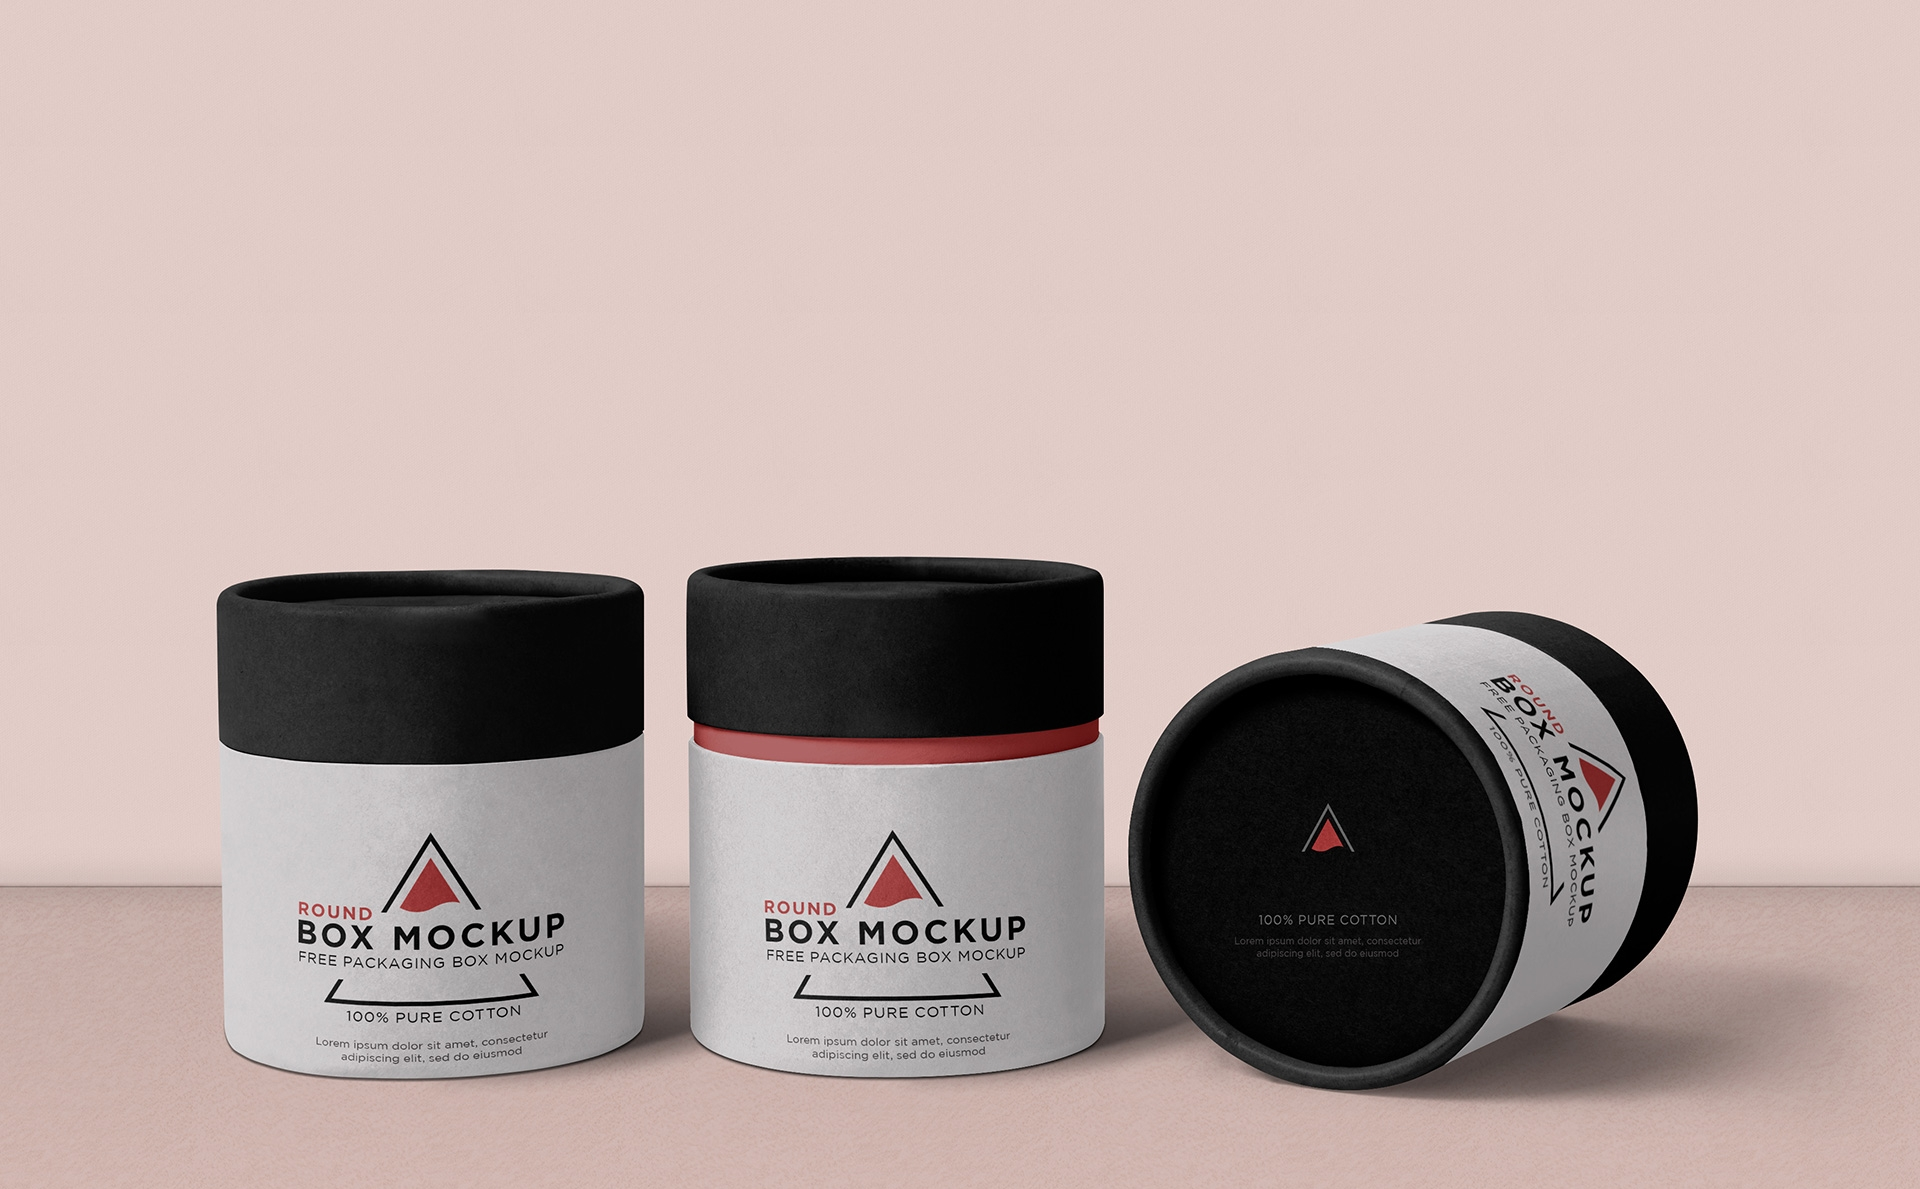 圆形包装盒样机  包装样机   素材291-cylindrical-cardboard-box-mockup-free